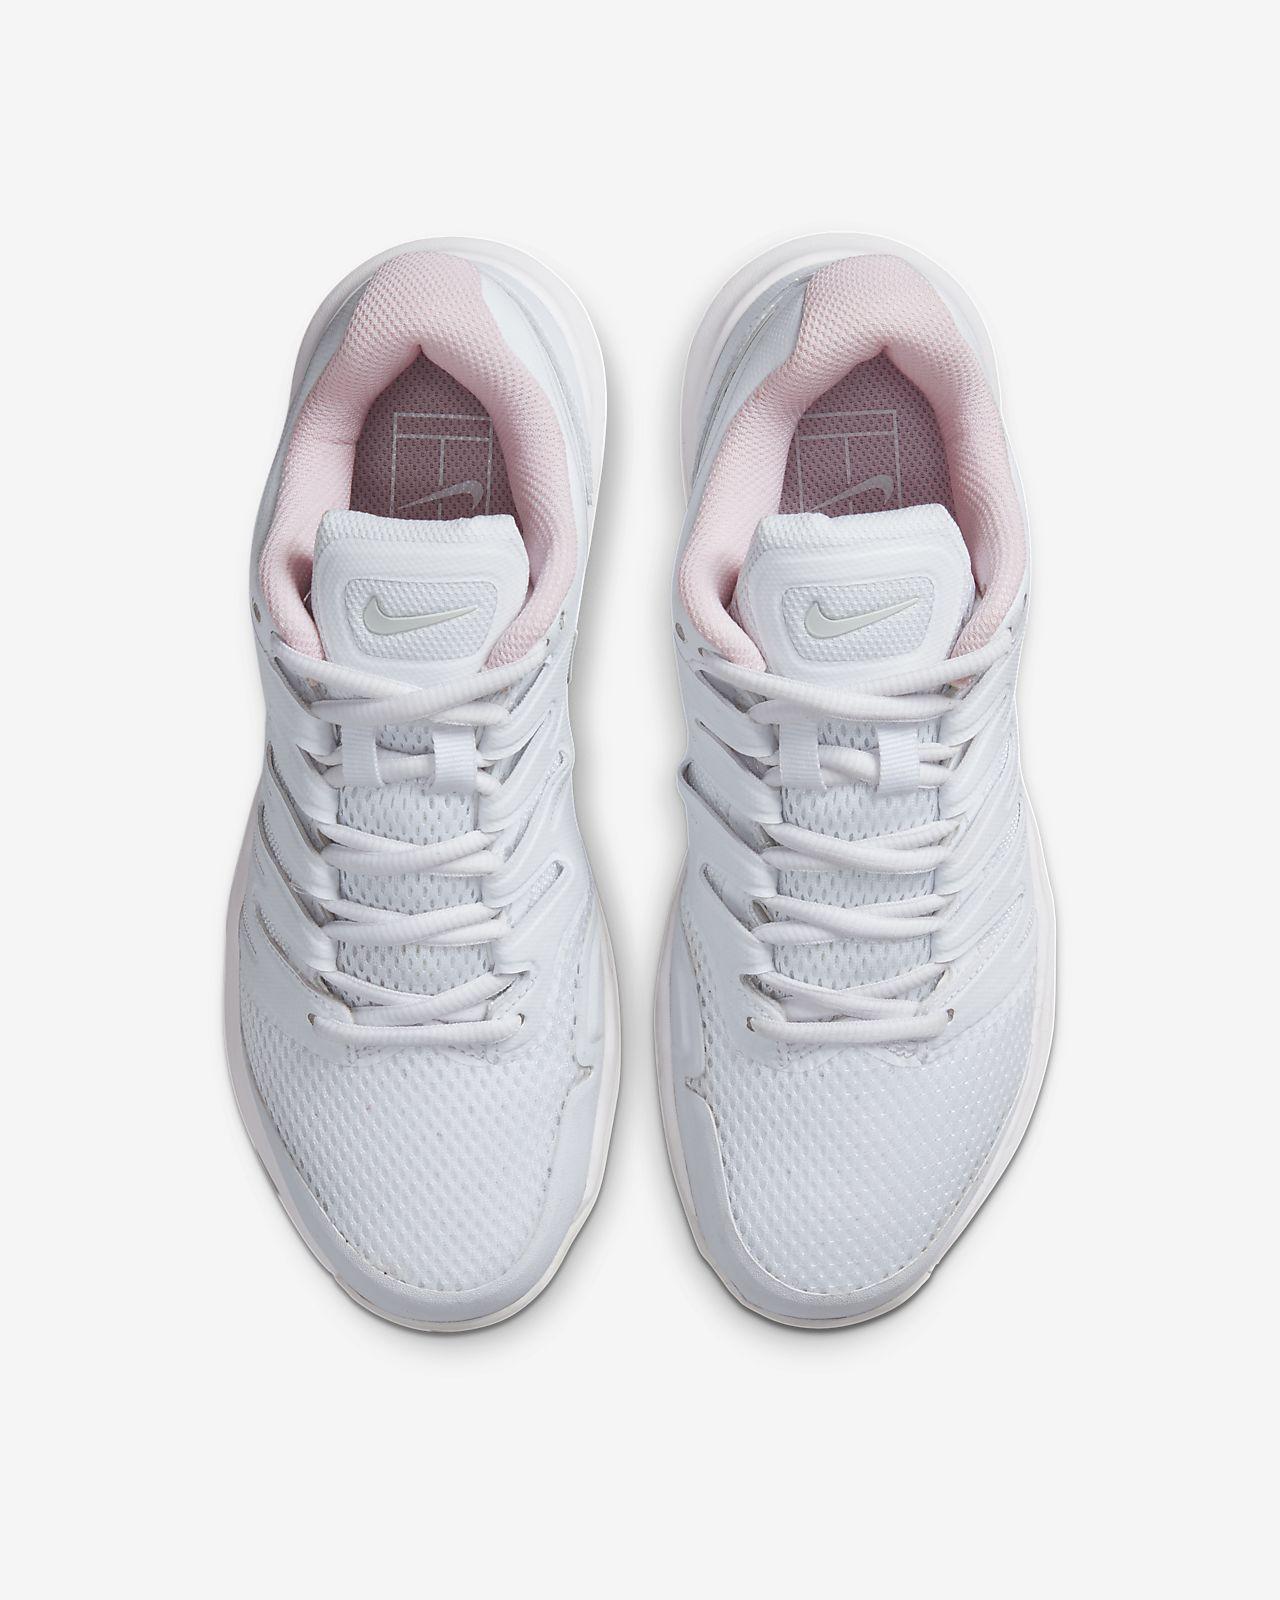 Hard Court Tennis Shoe. Nike NL